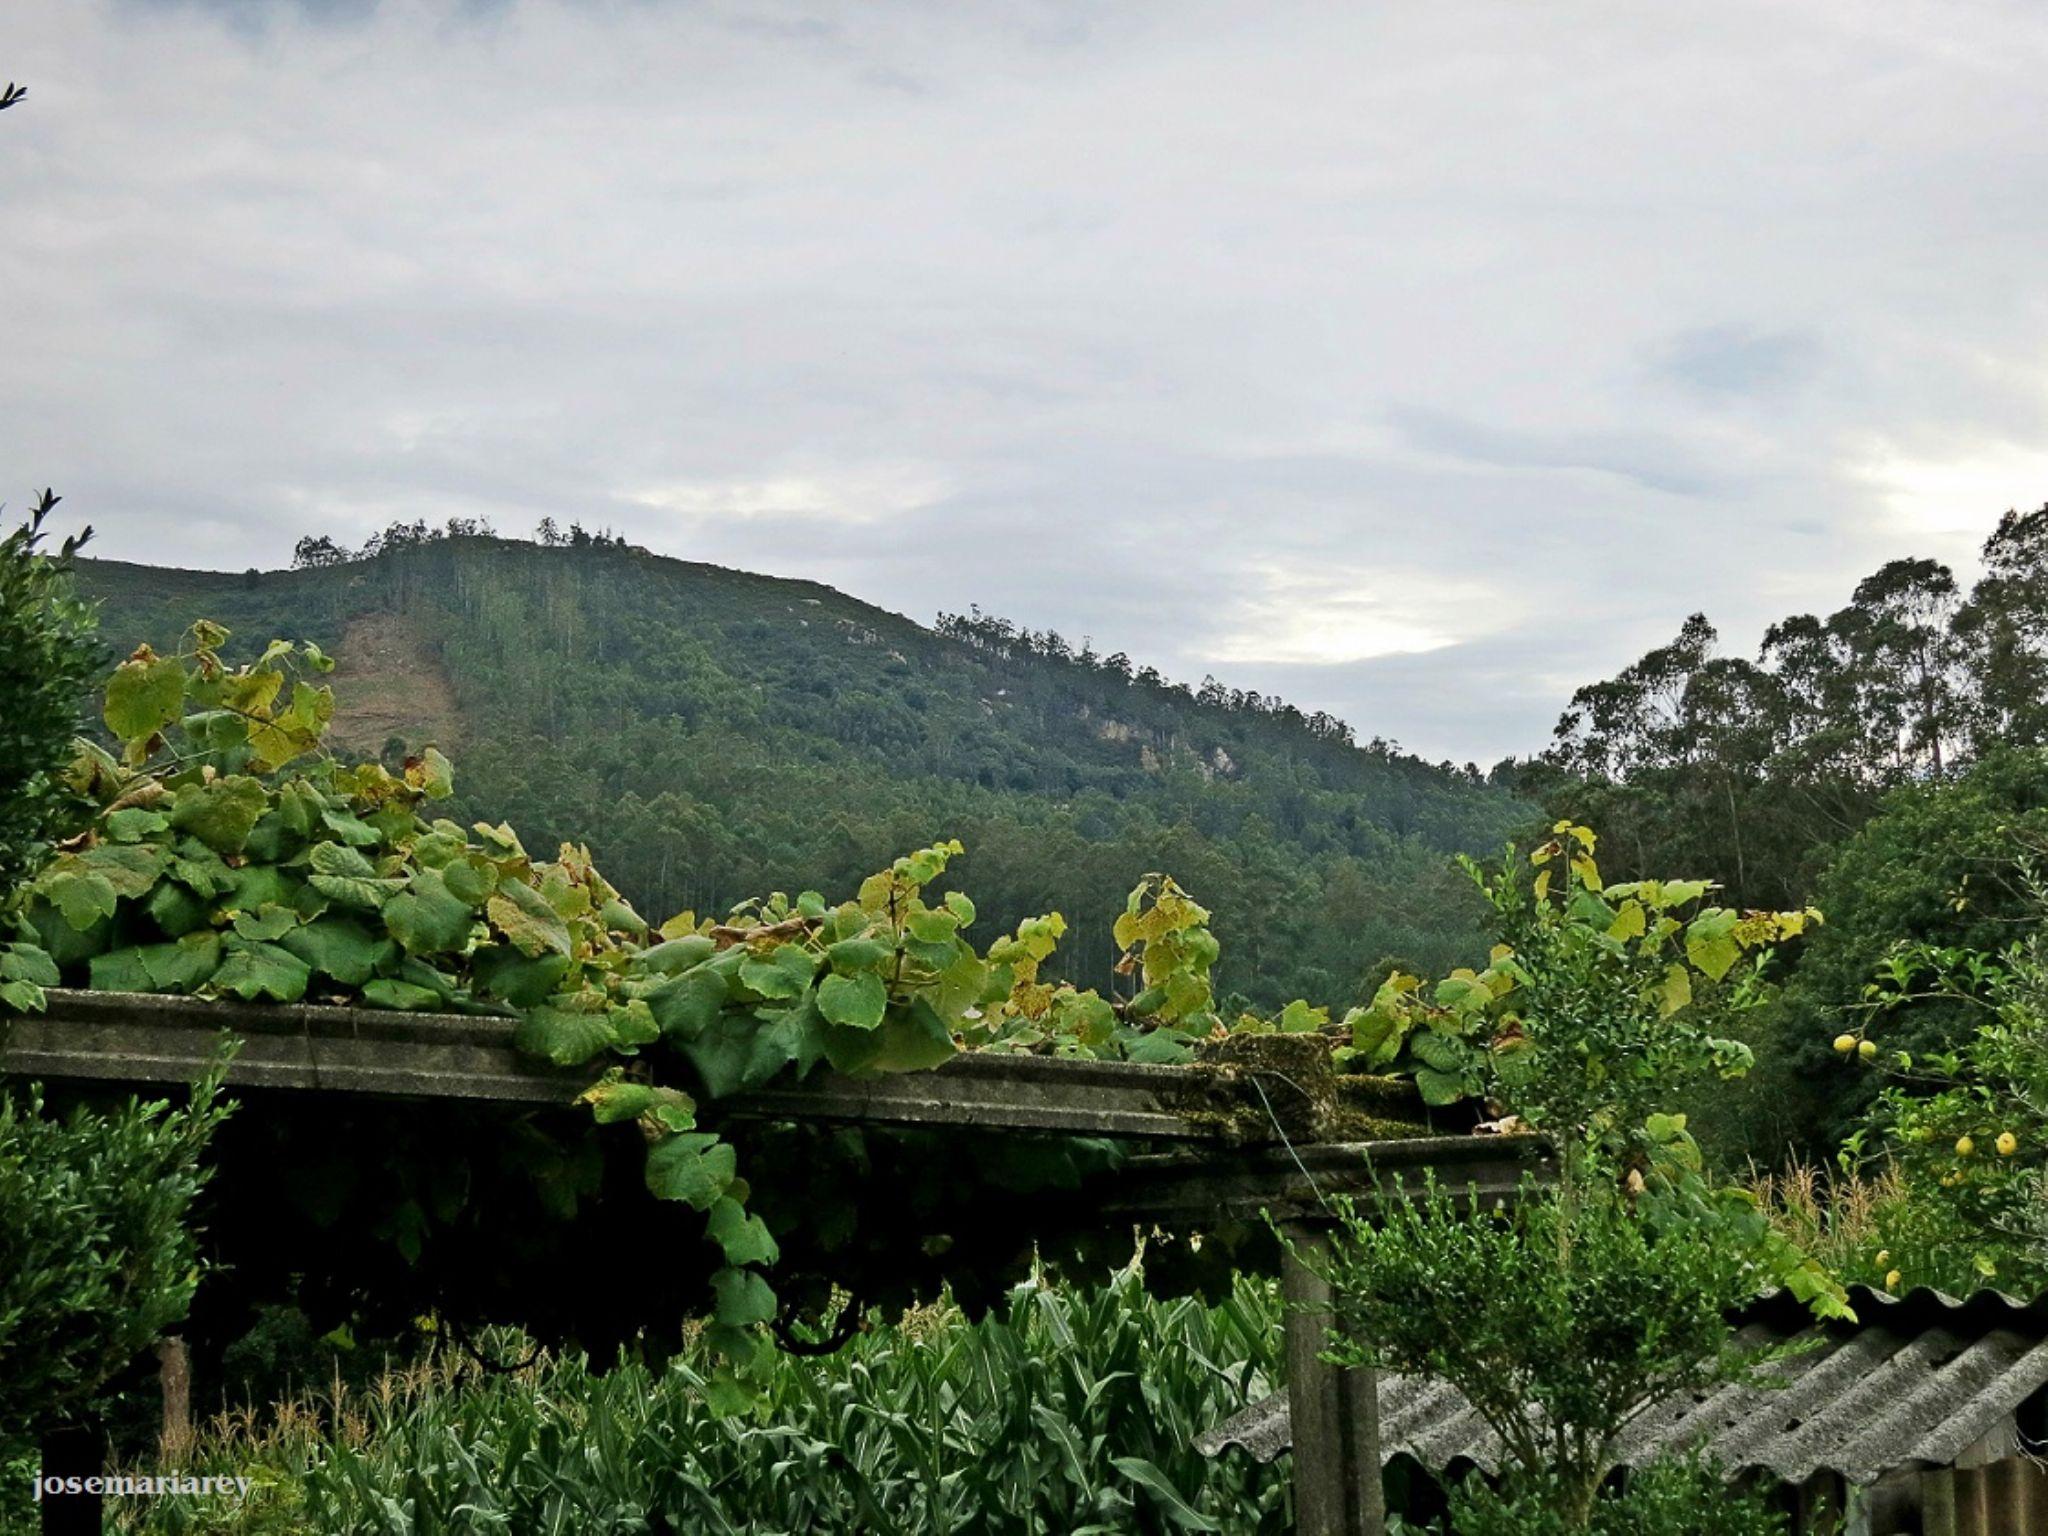 Atardecer en la montaña by josemariareymontes